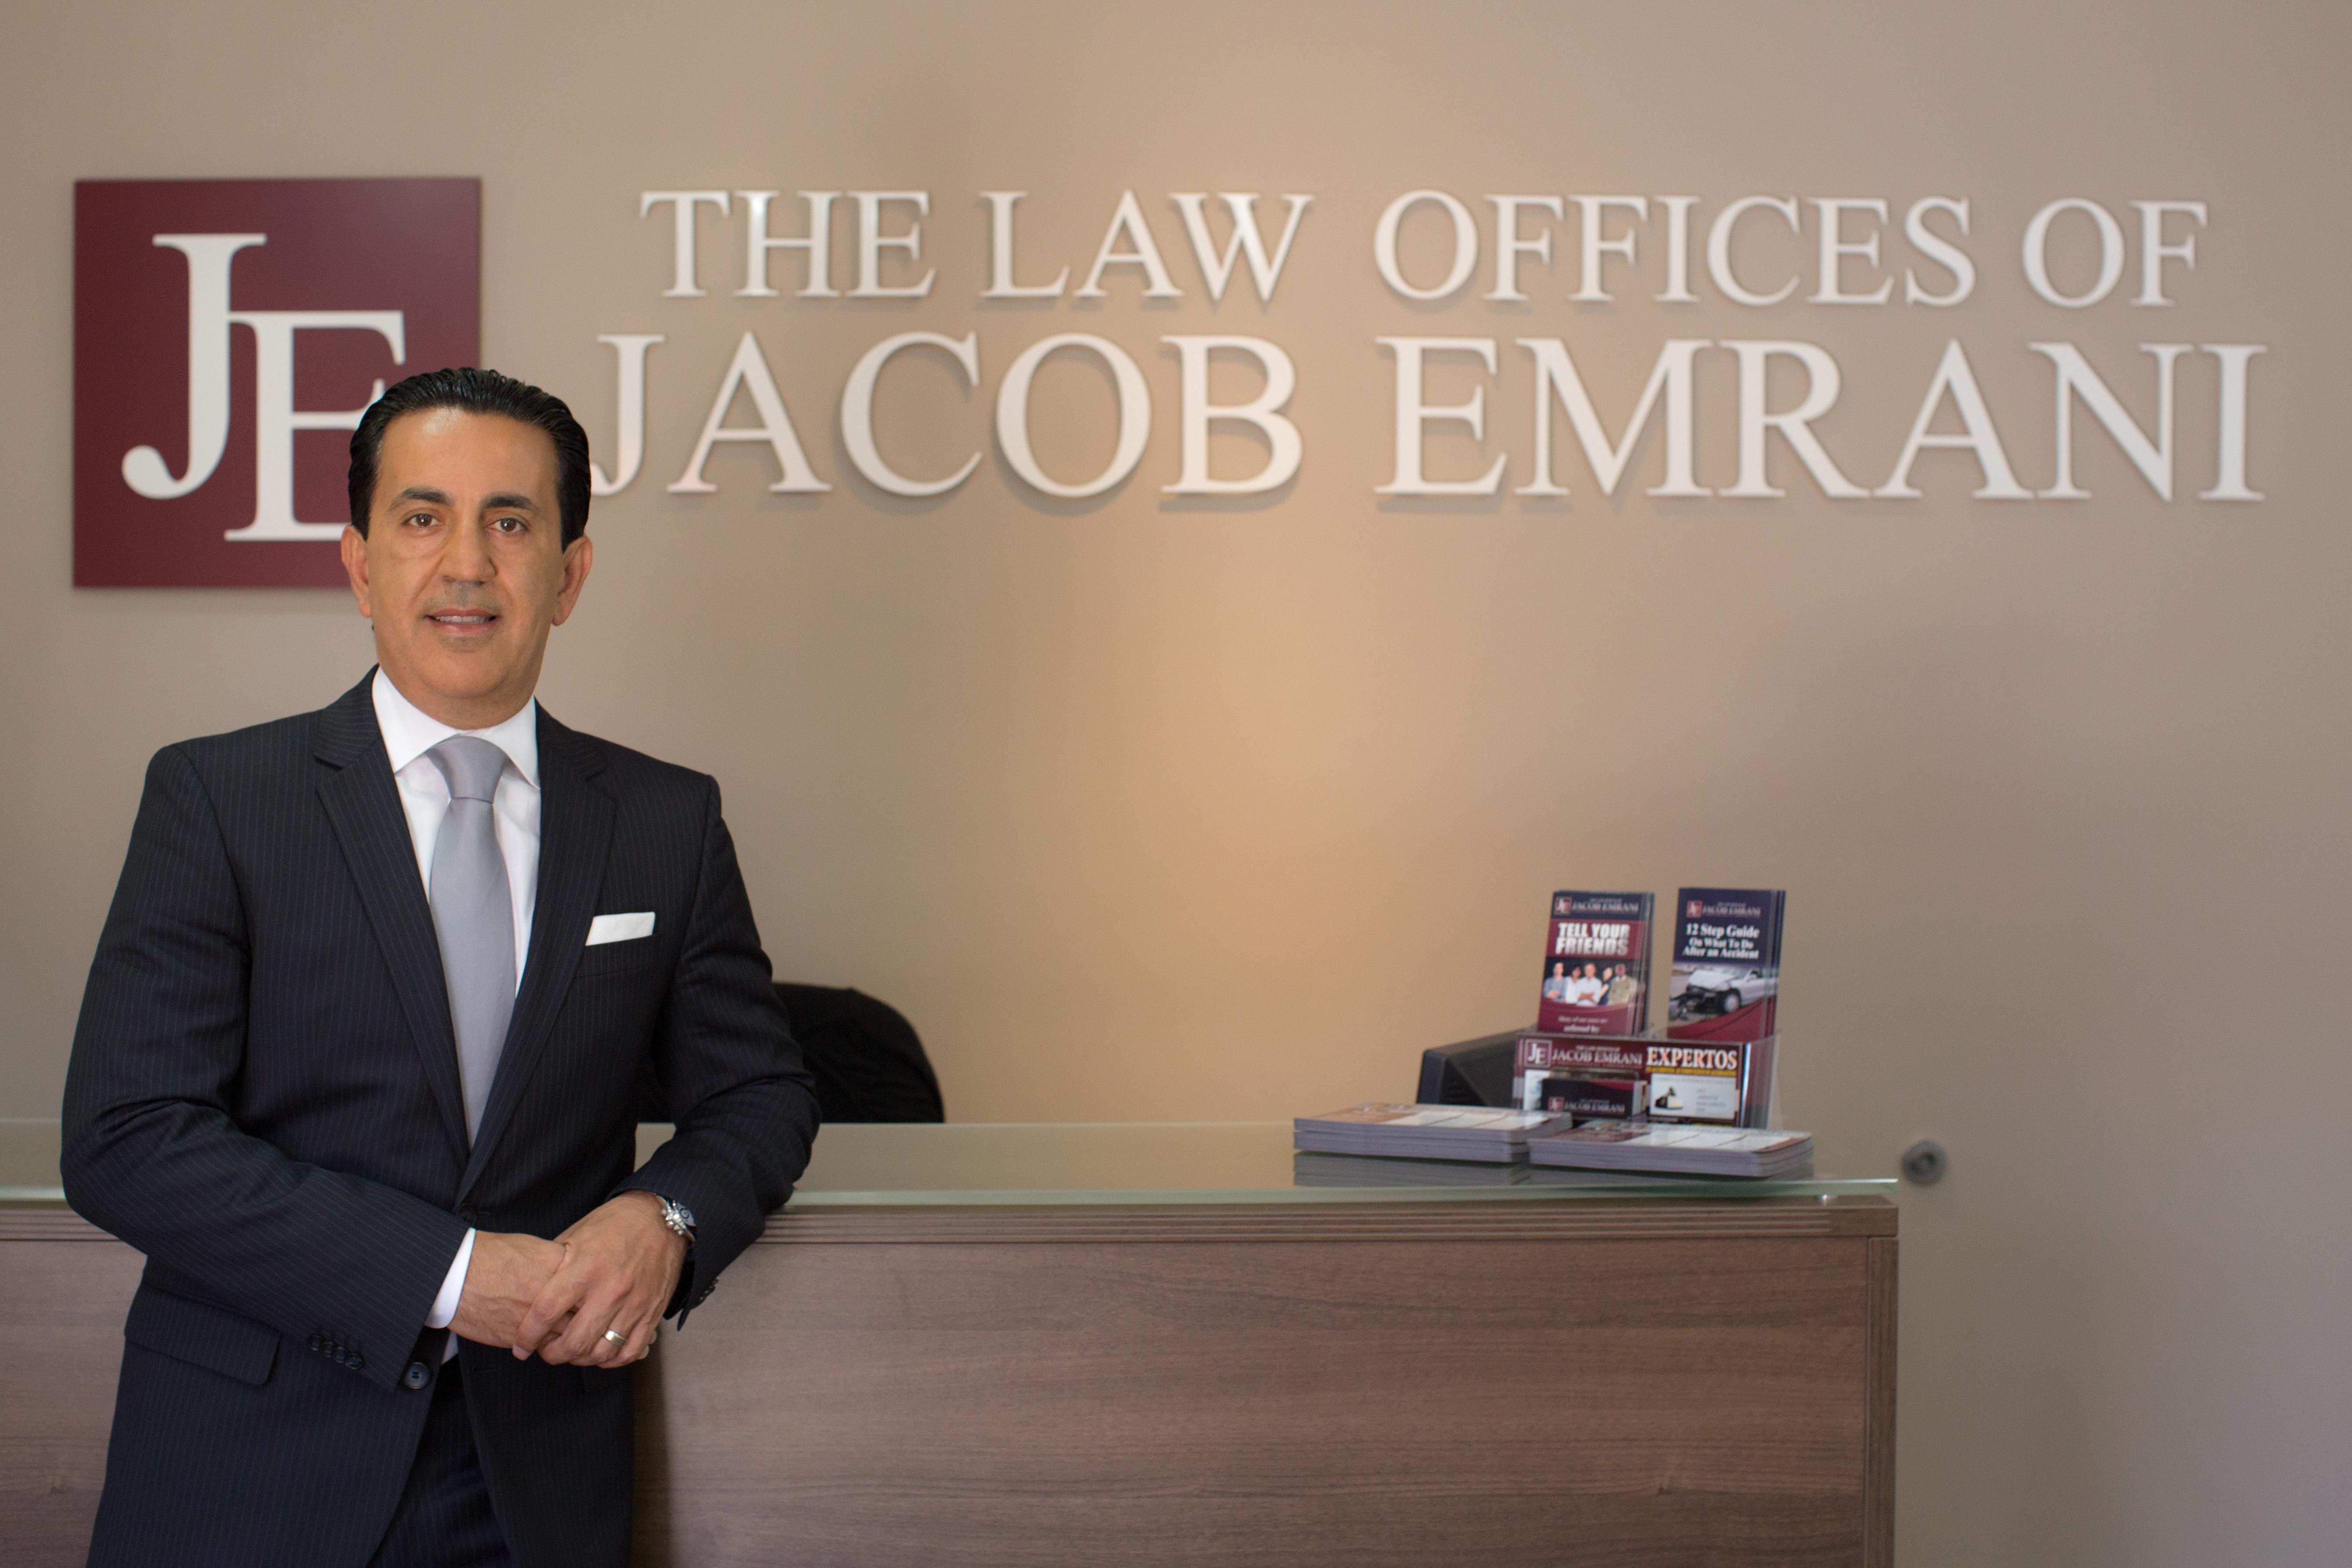 Law Offices Of Jacob Emrani Los Angeles Ca 90015 Yp Com